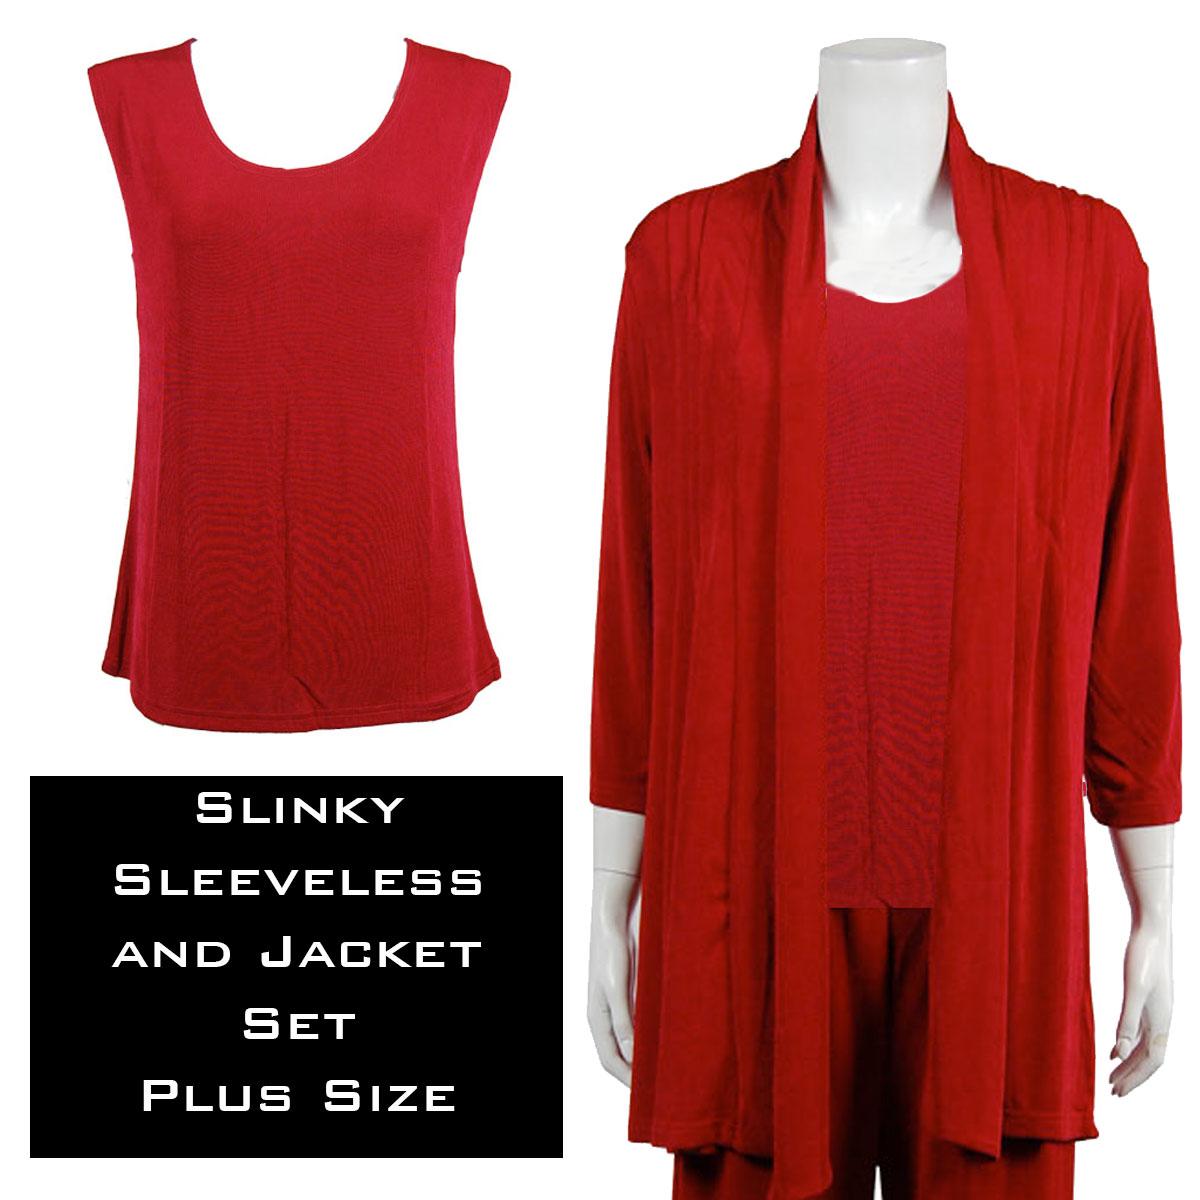 Slinky Jacket Set